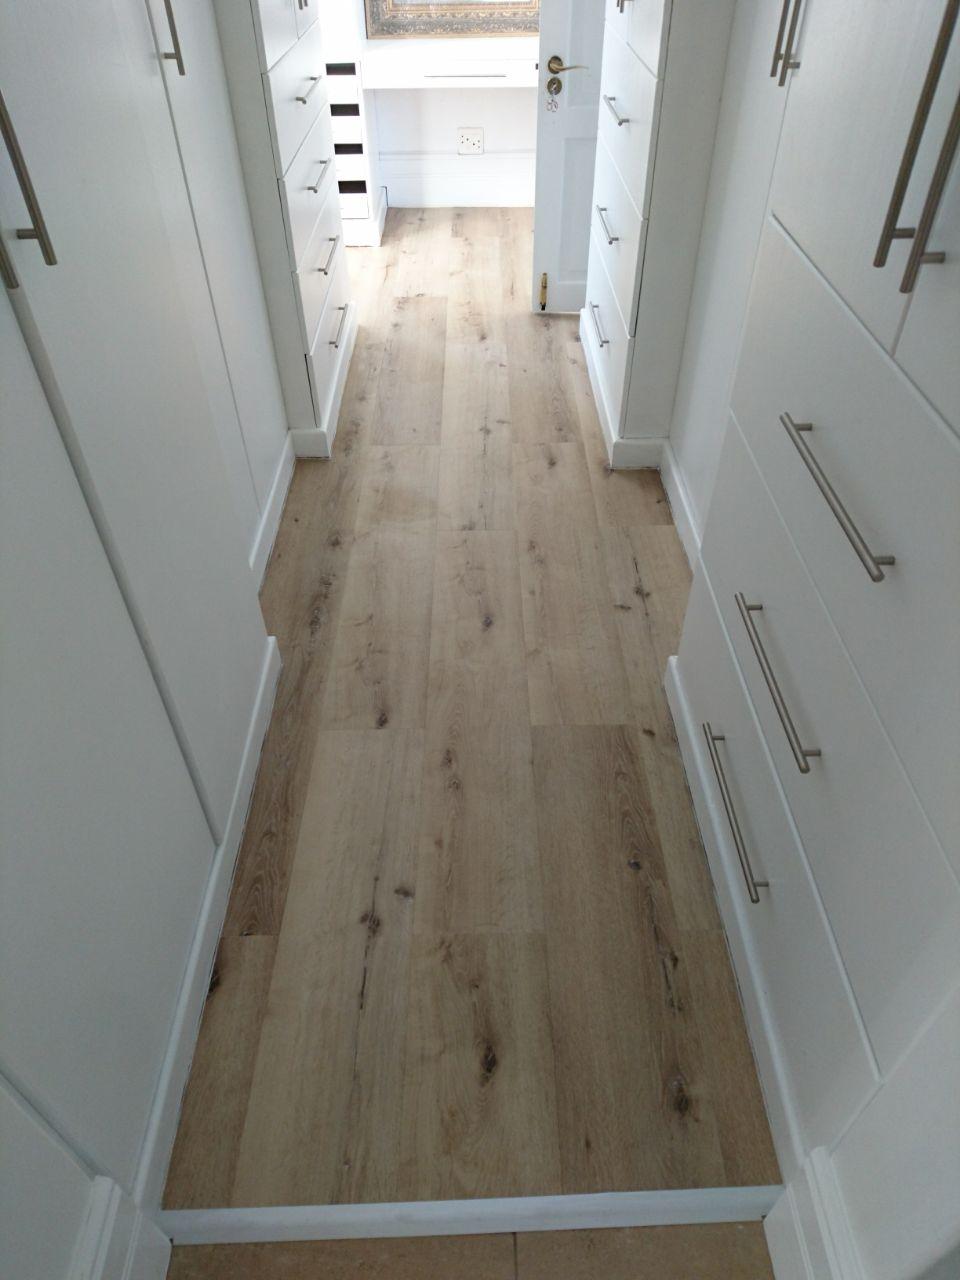 Aspen Original Luxury Vinyl Flooring at Carpet World Flooring Cape Town